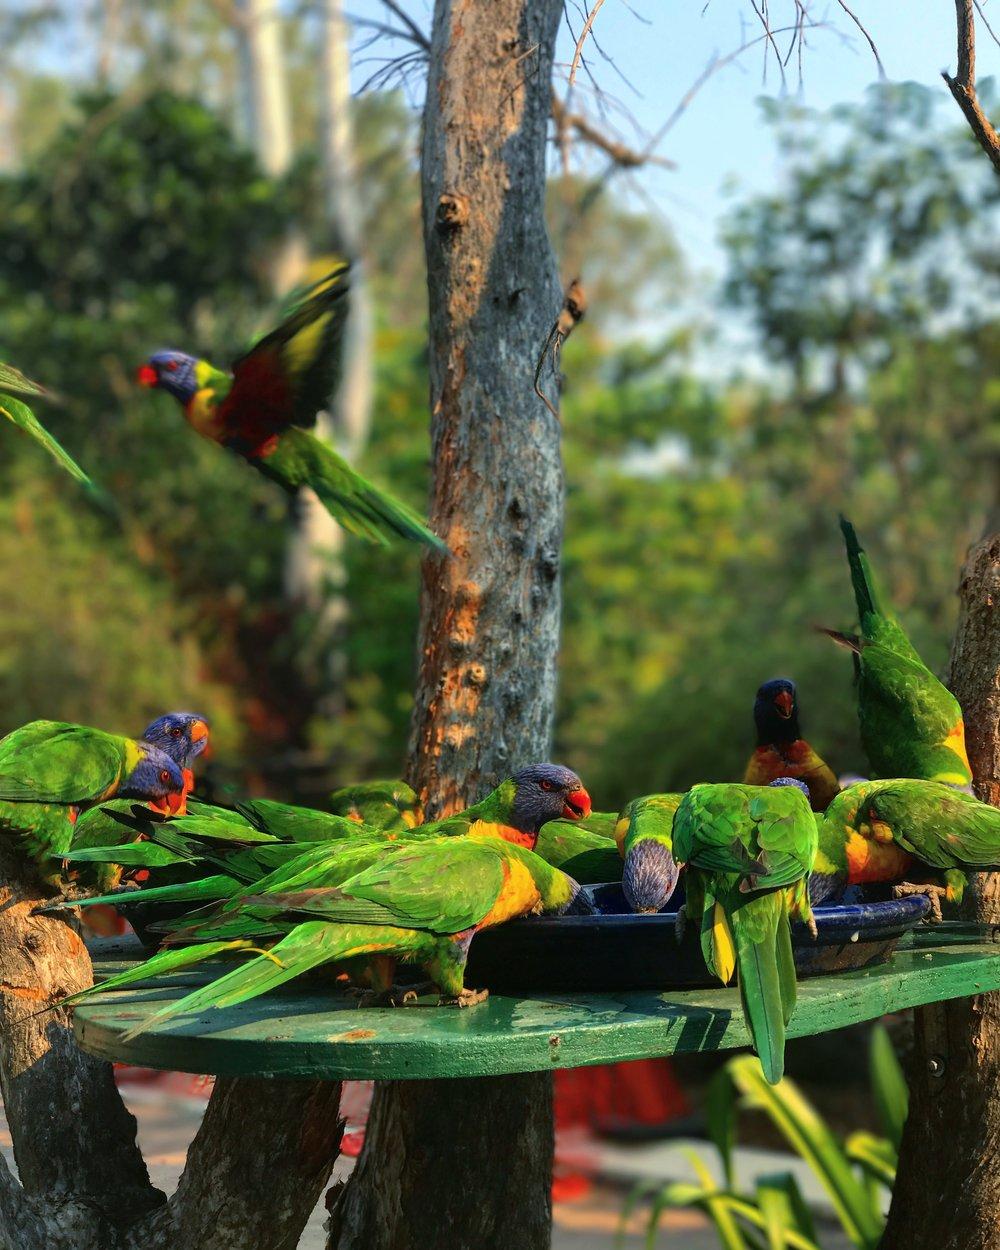 Some beautiful rainbow coloured wild birds at the Botanical Gardens.